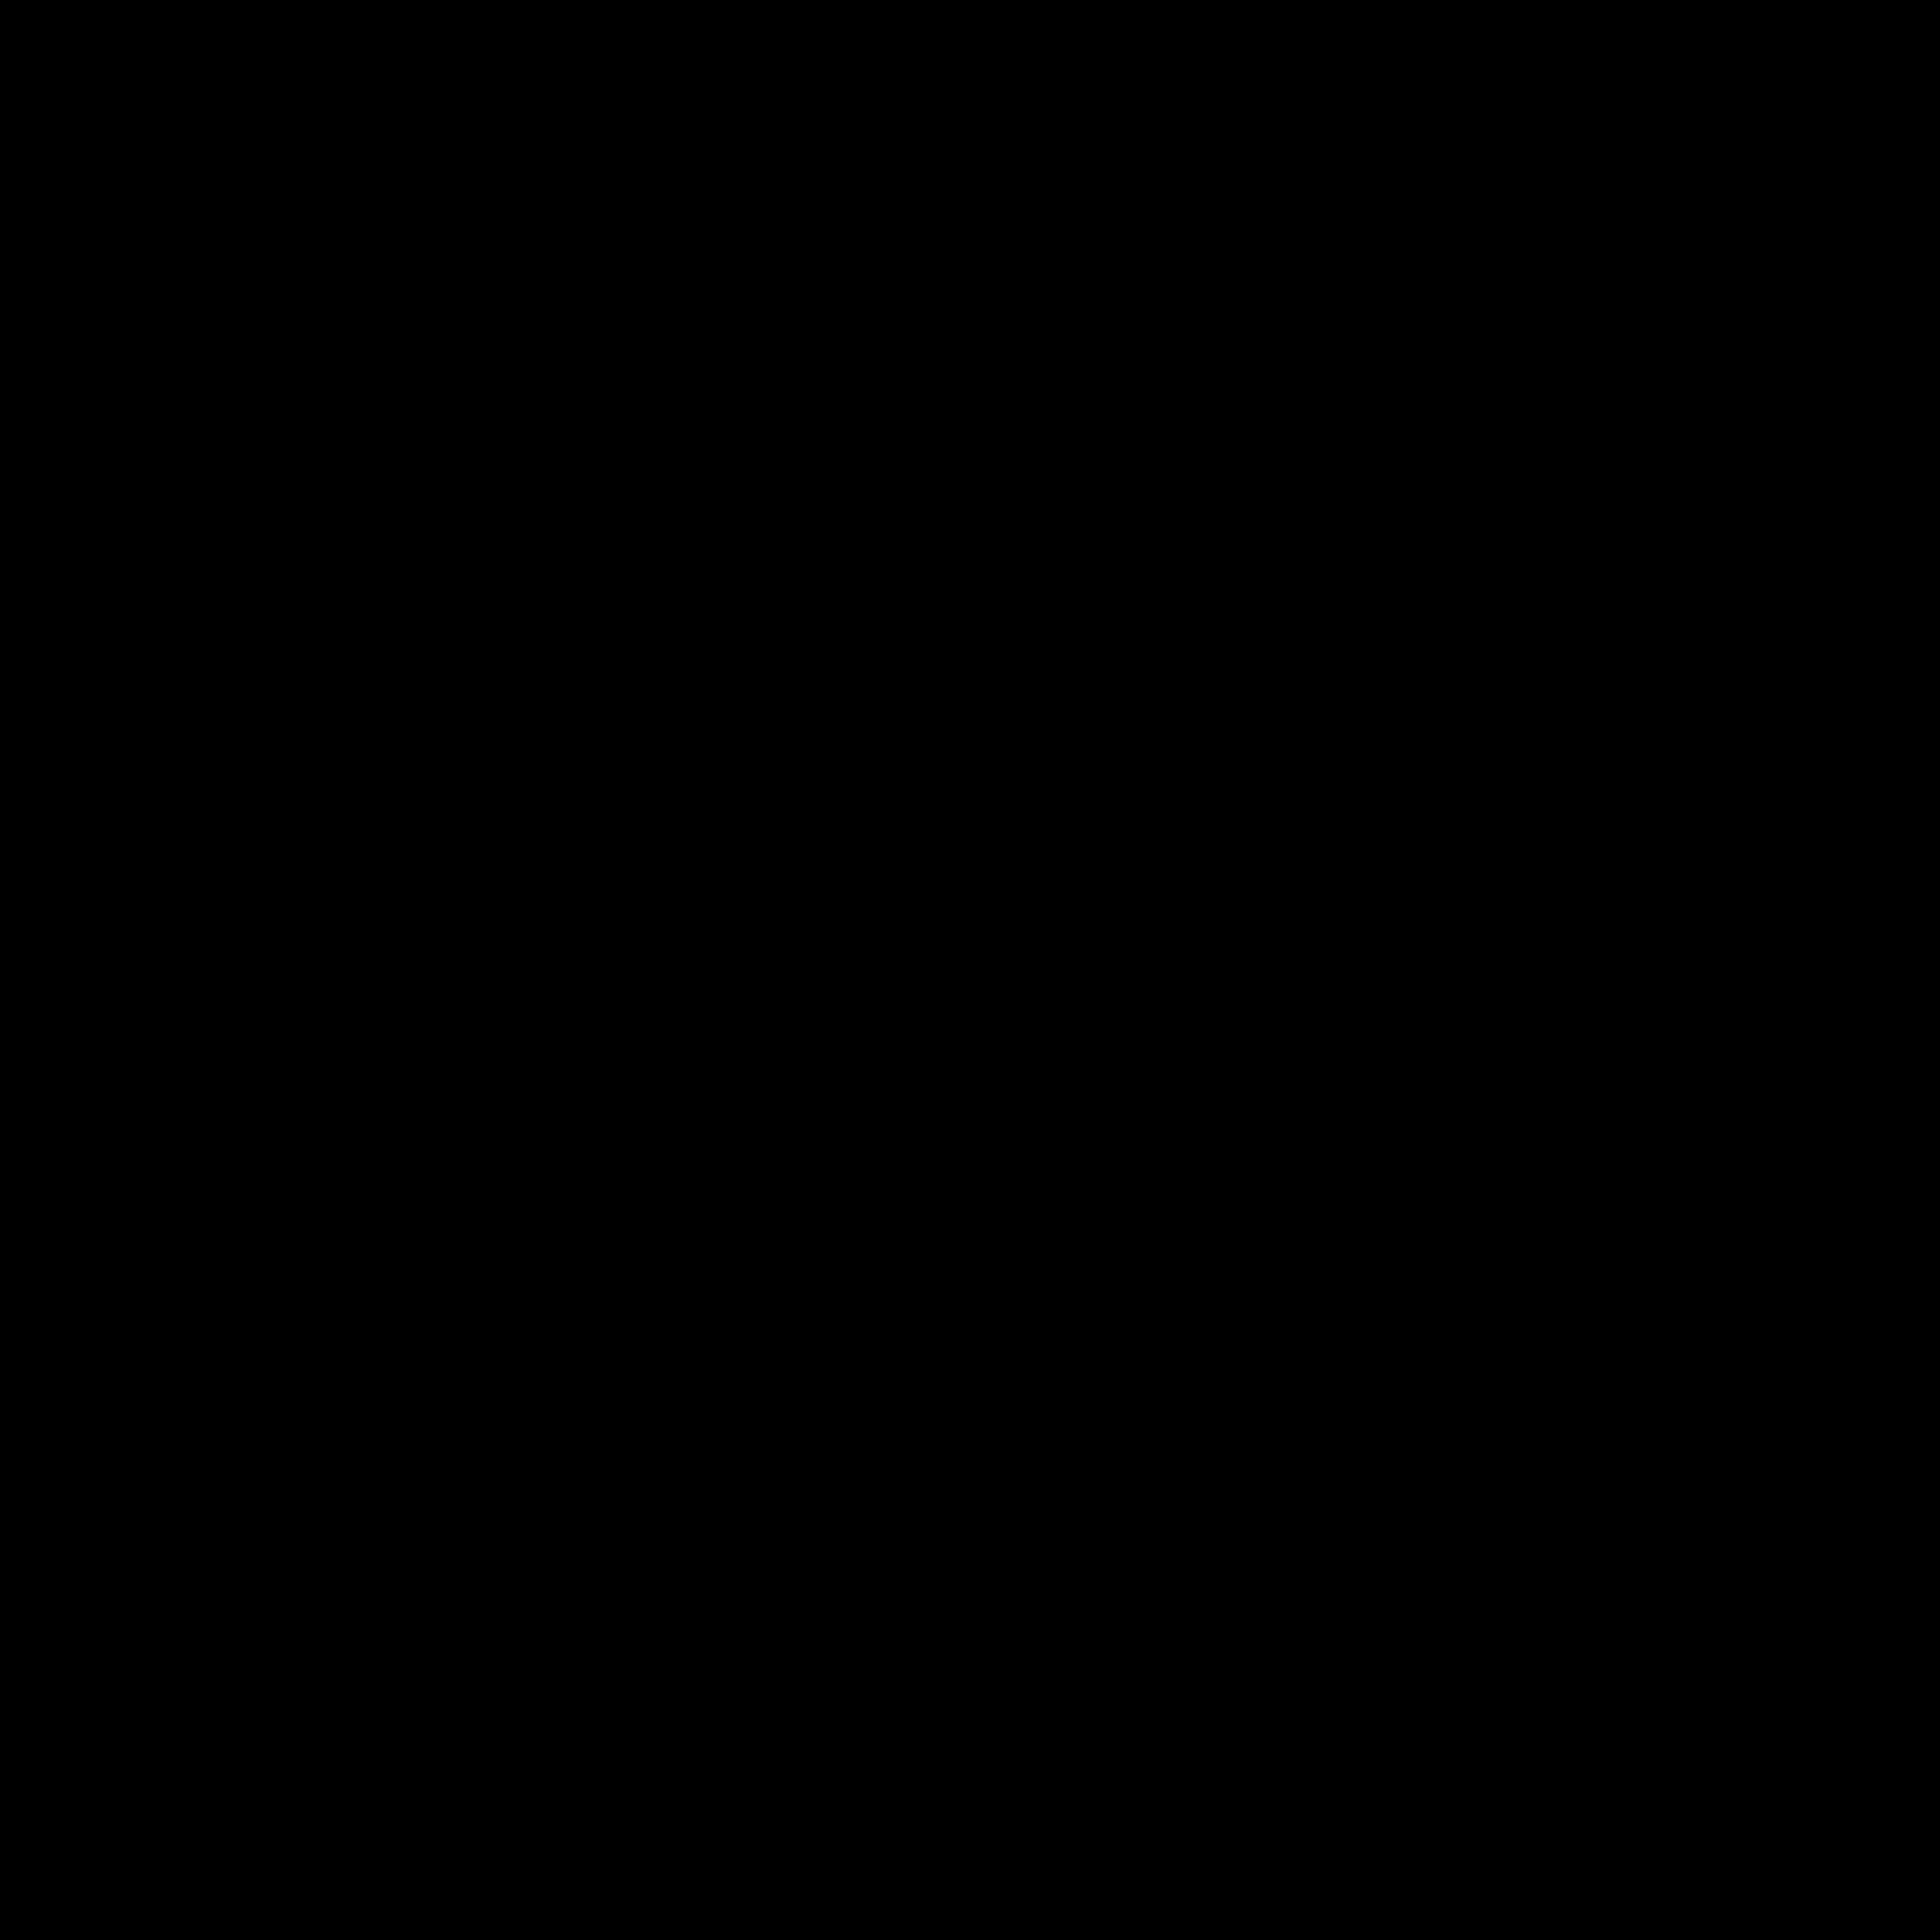 PsychologySymbol